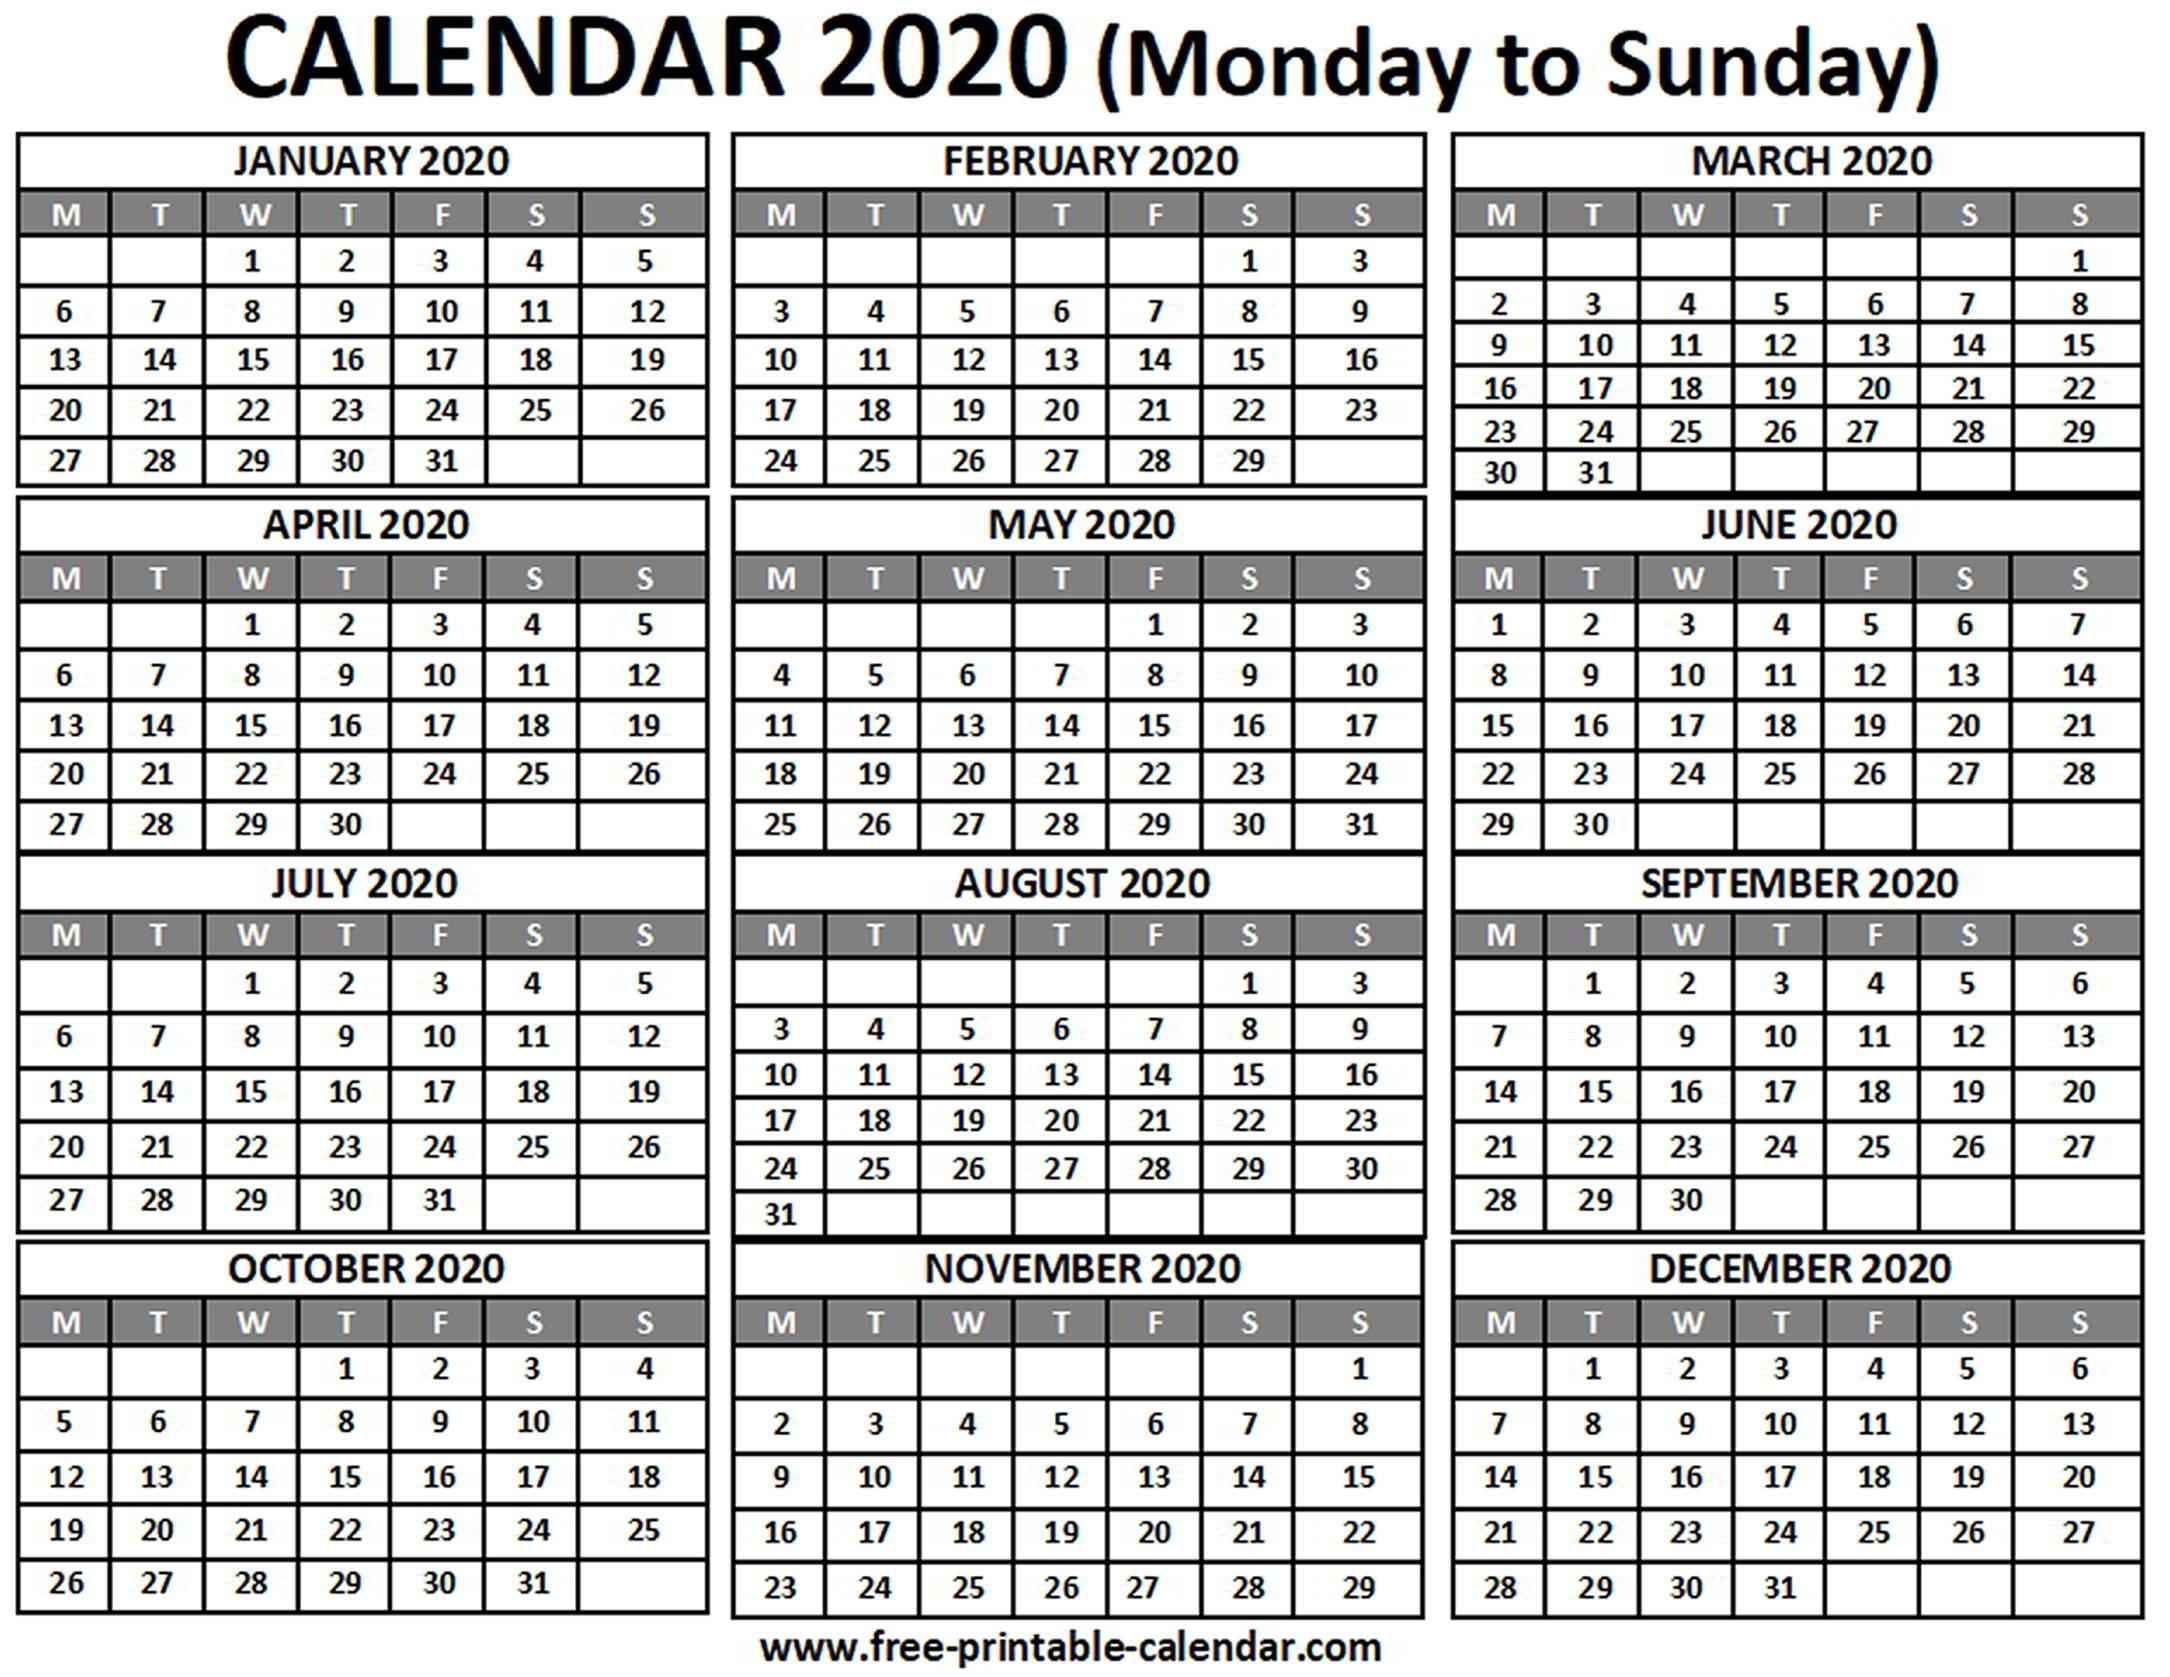 2020 Calendar - Free-Printable-Calendar intended for Calendar 2020 Printable Calendar Starting With Monday